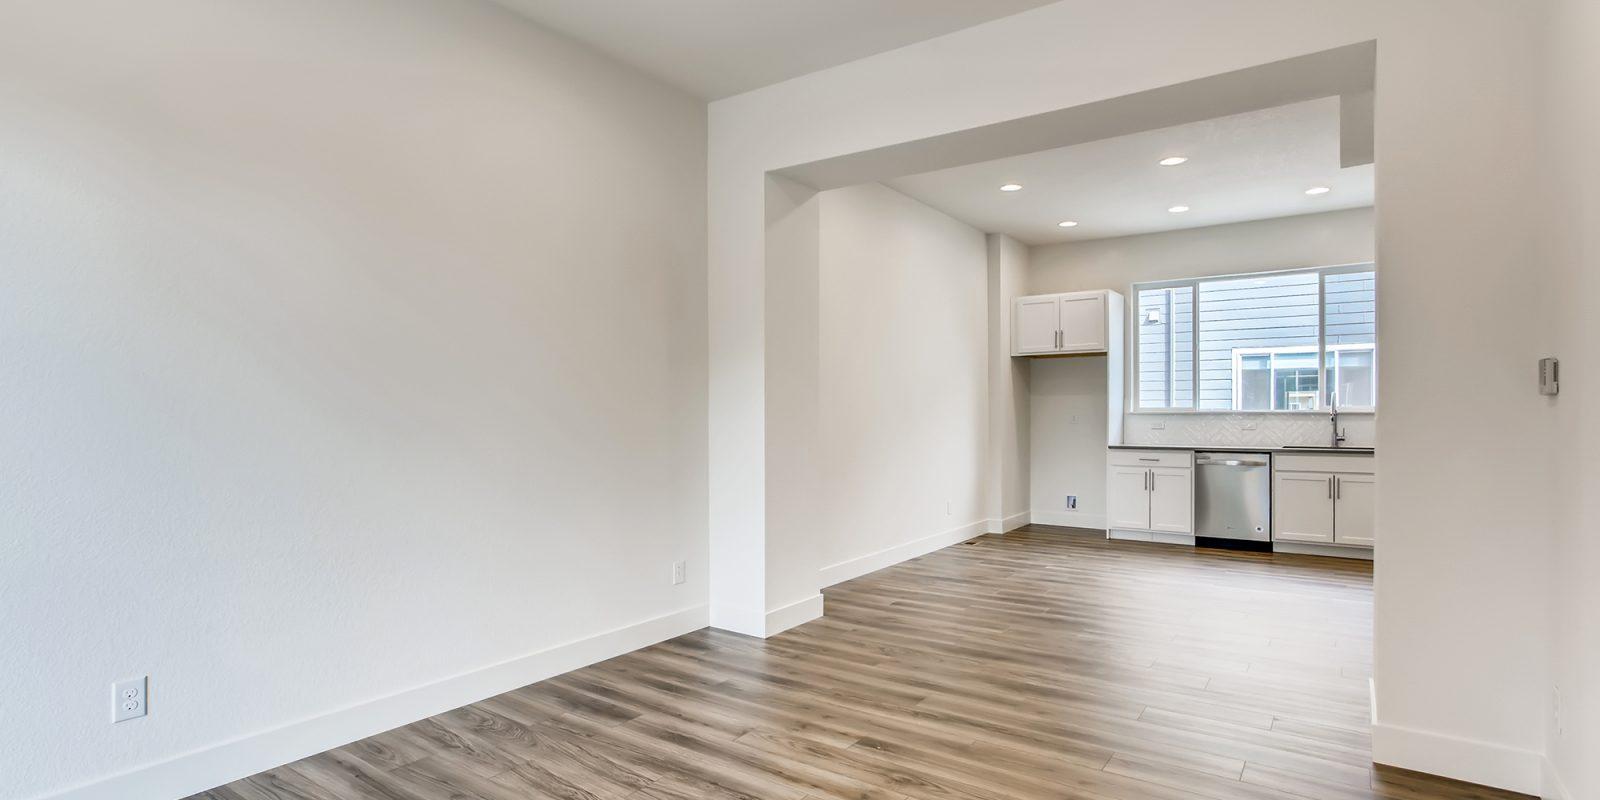 WestRidge: Garland - Living Room & Dining Nook